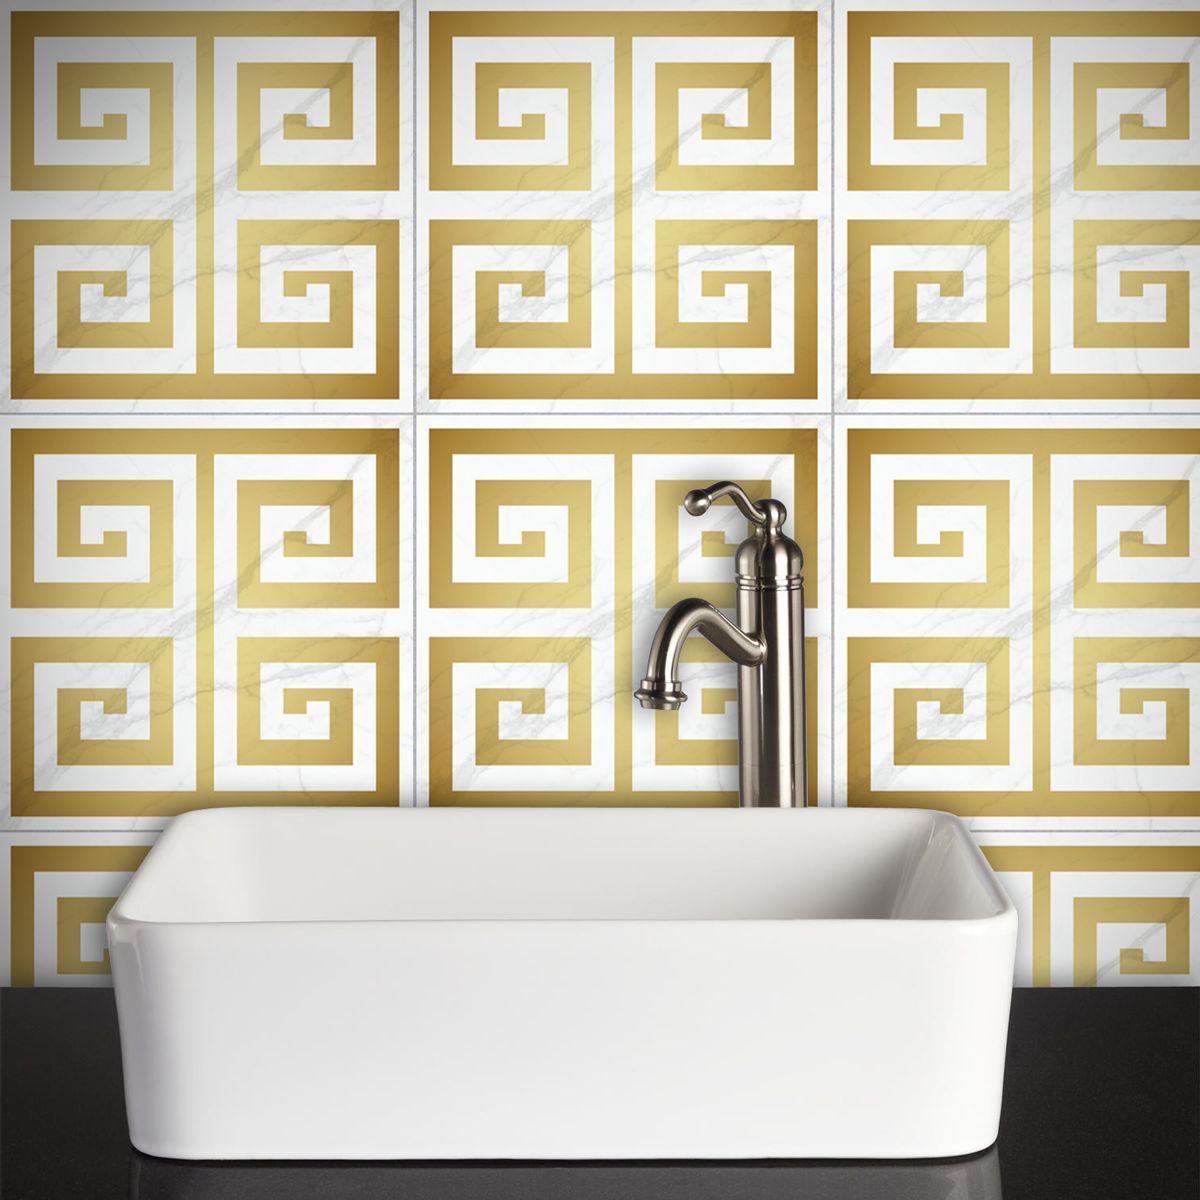 49++ Bathroom tile decals ideas